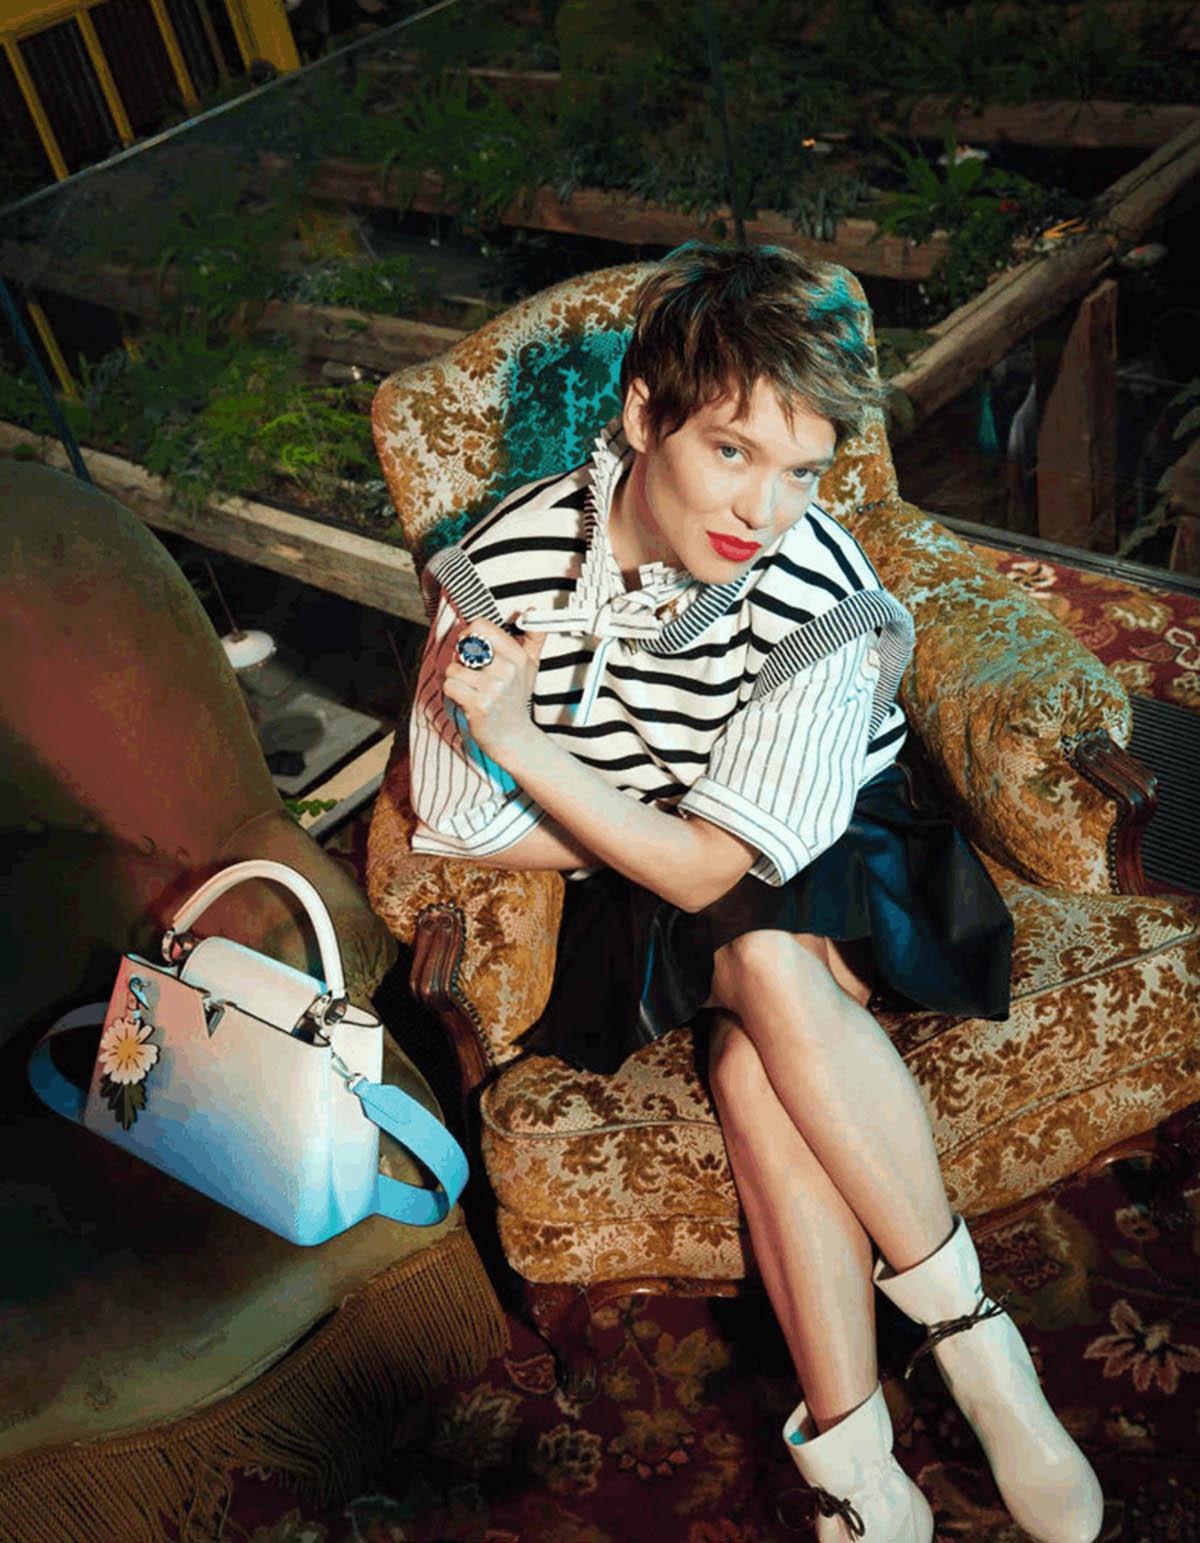 Léa Seydoux covers Madame Figaro July 9th, 2021 by Kourtney Roy